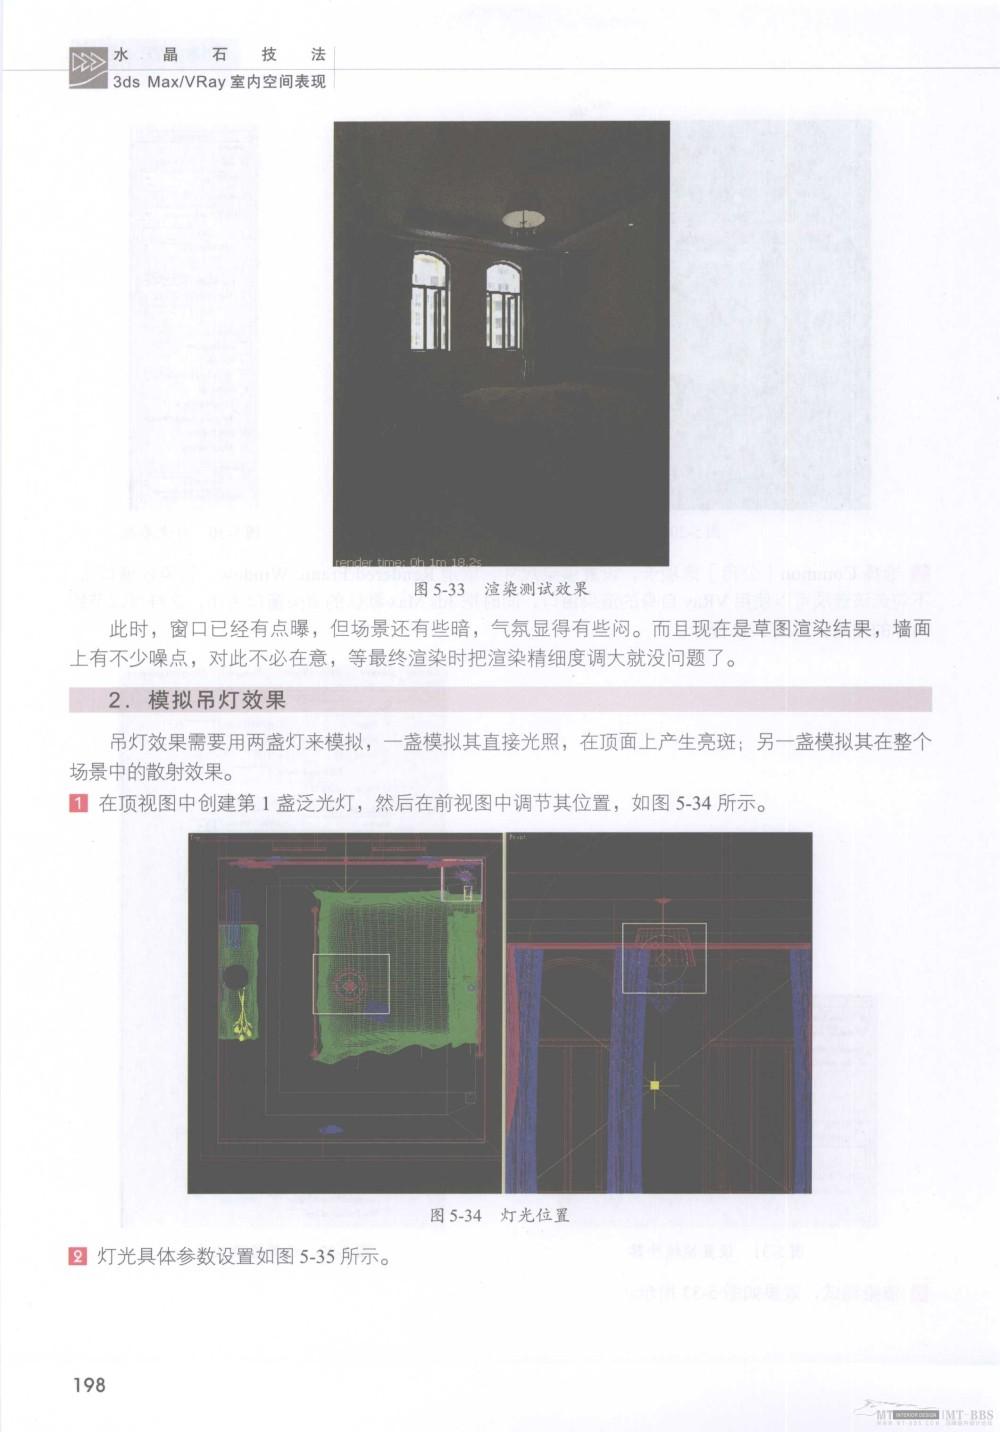 水晶石技法-3ds_Max&VRay室内空间表现_水晶石技法-3ds_Max&VRay室内空间表现_页面_204.jpg